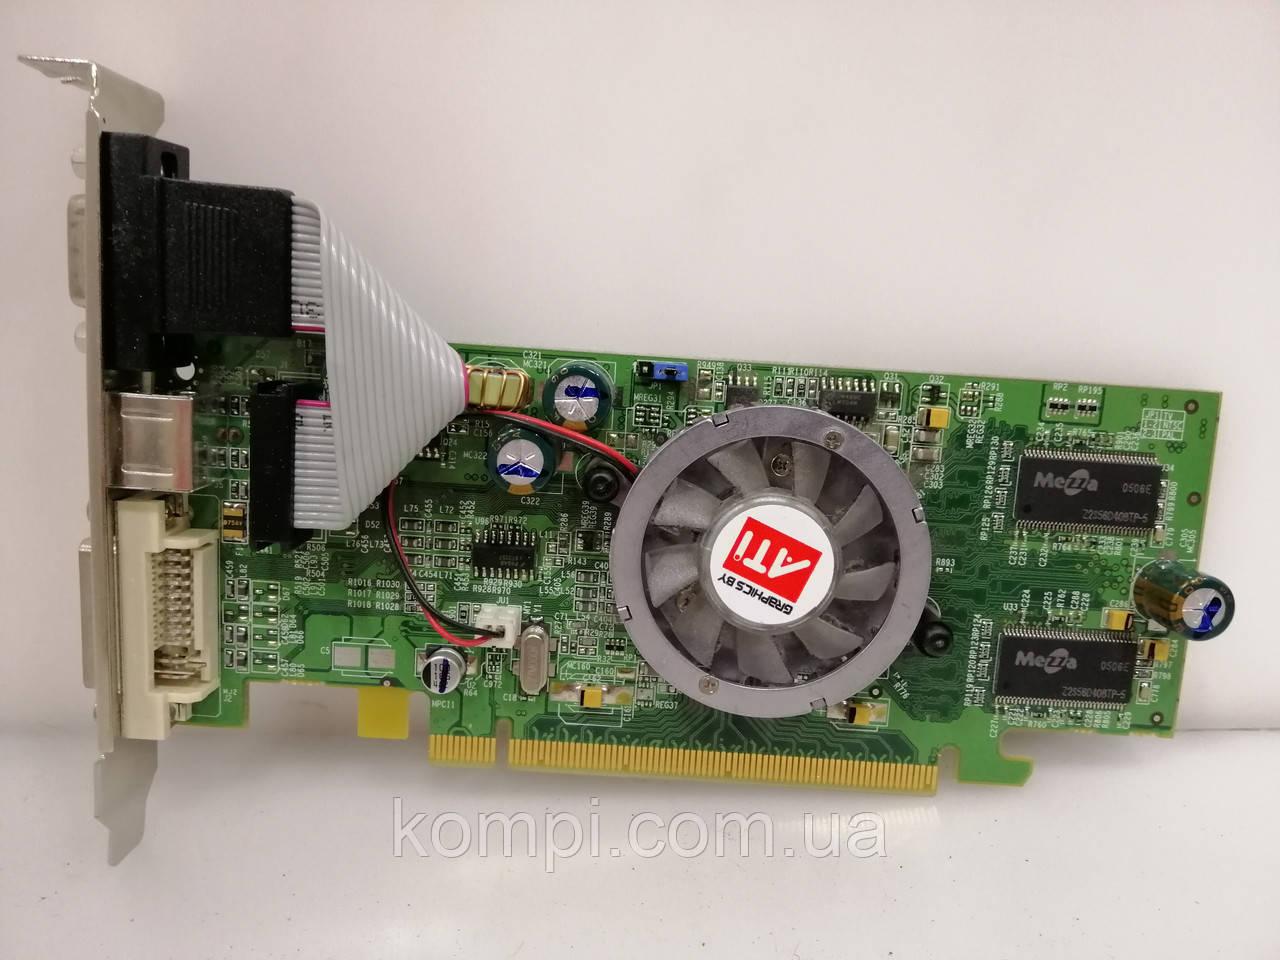 Видеокарта ATI X300 128mb PCI-E